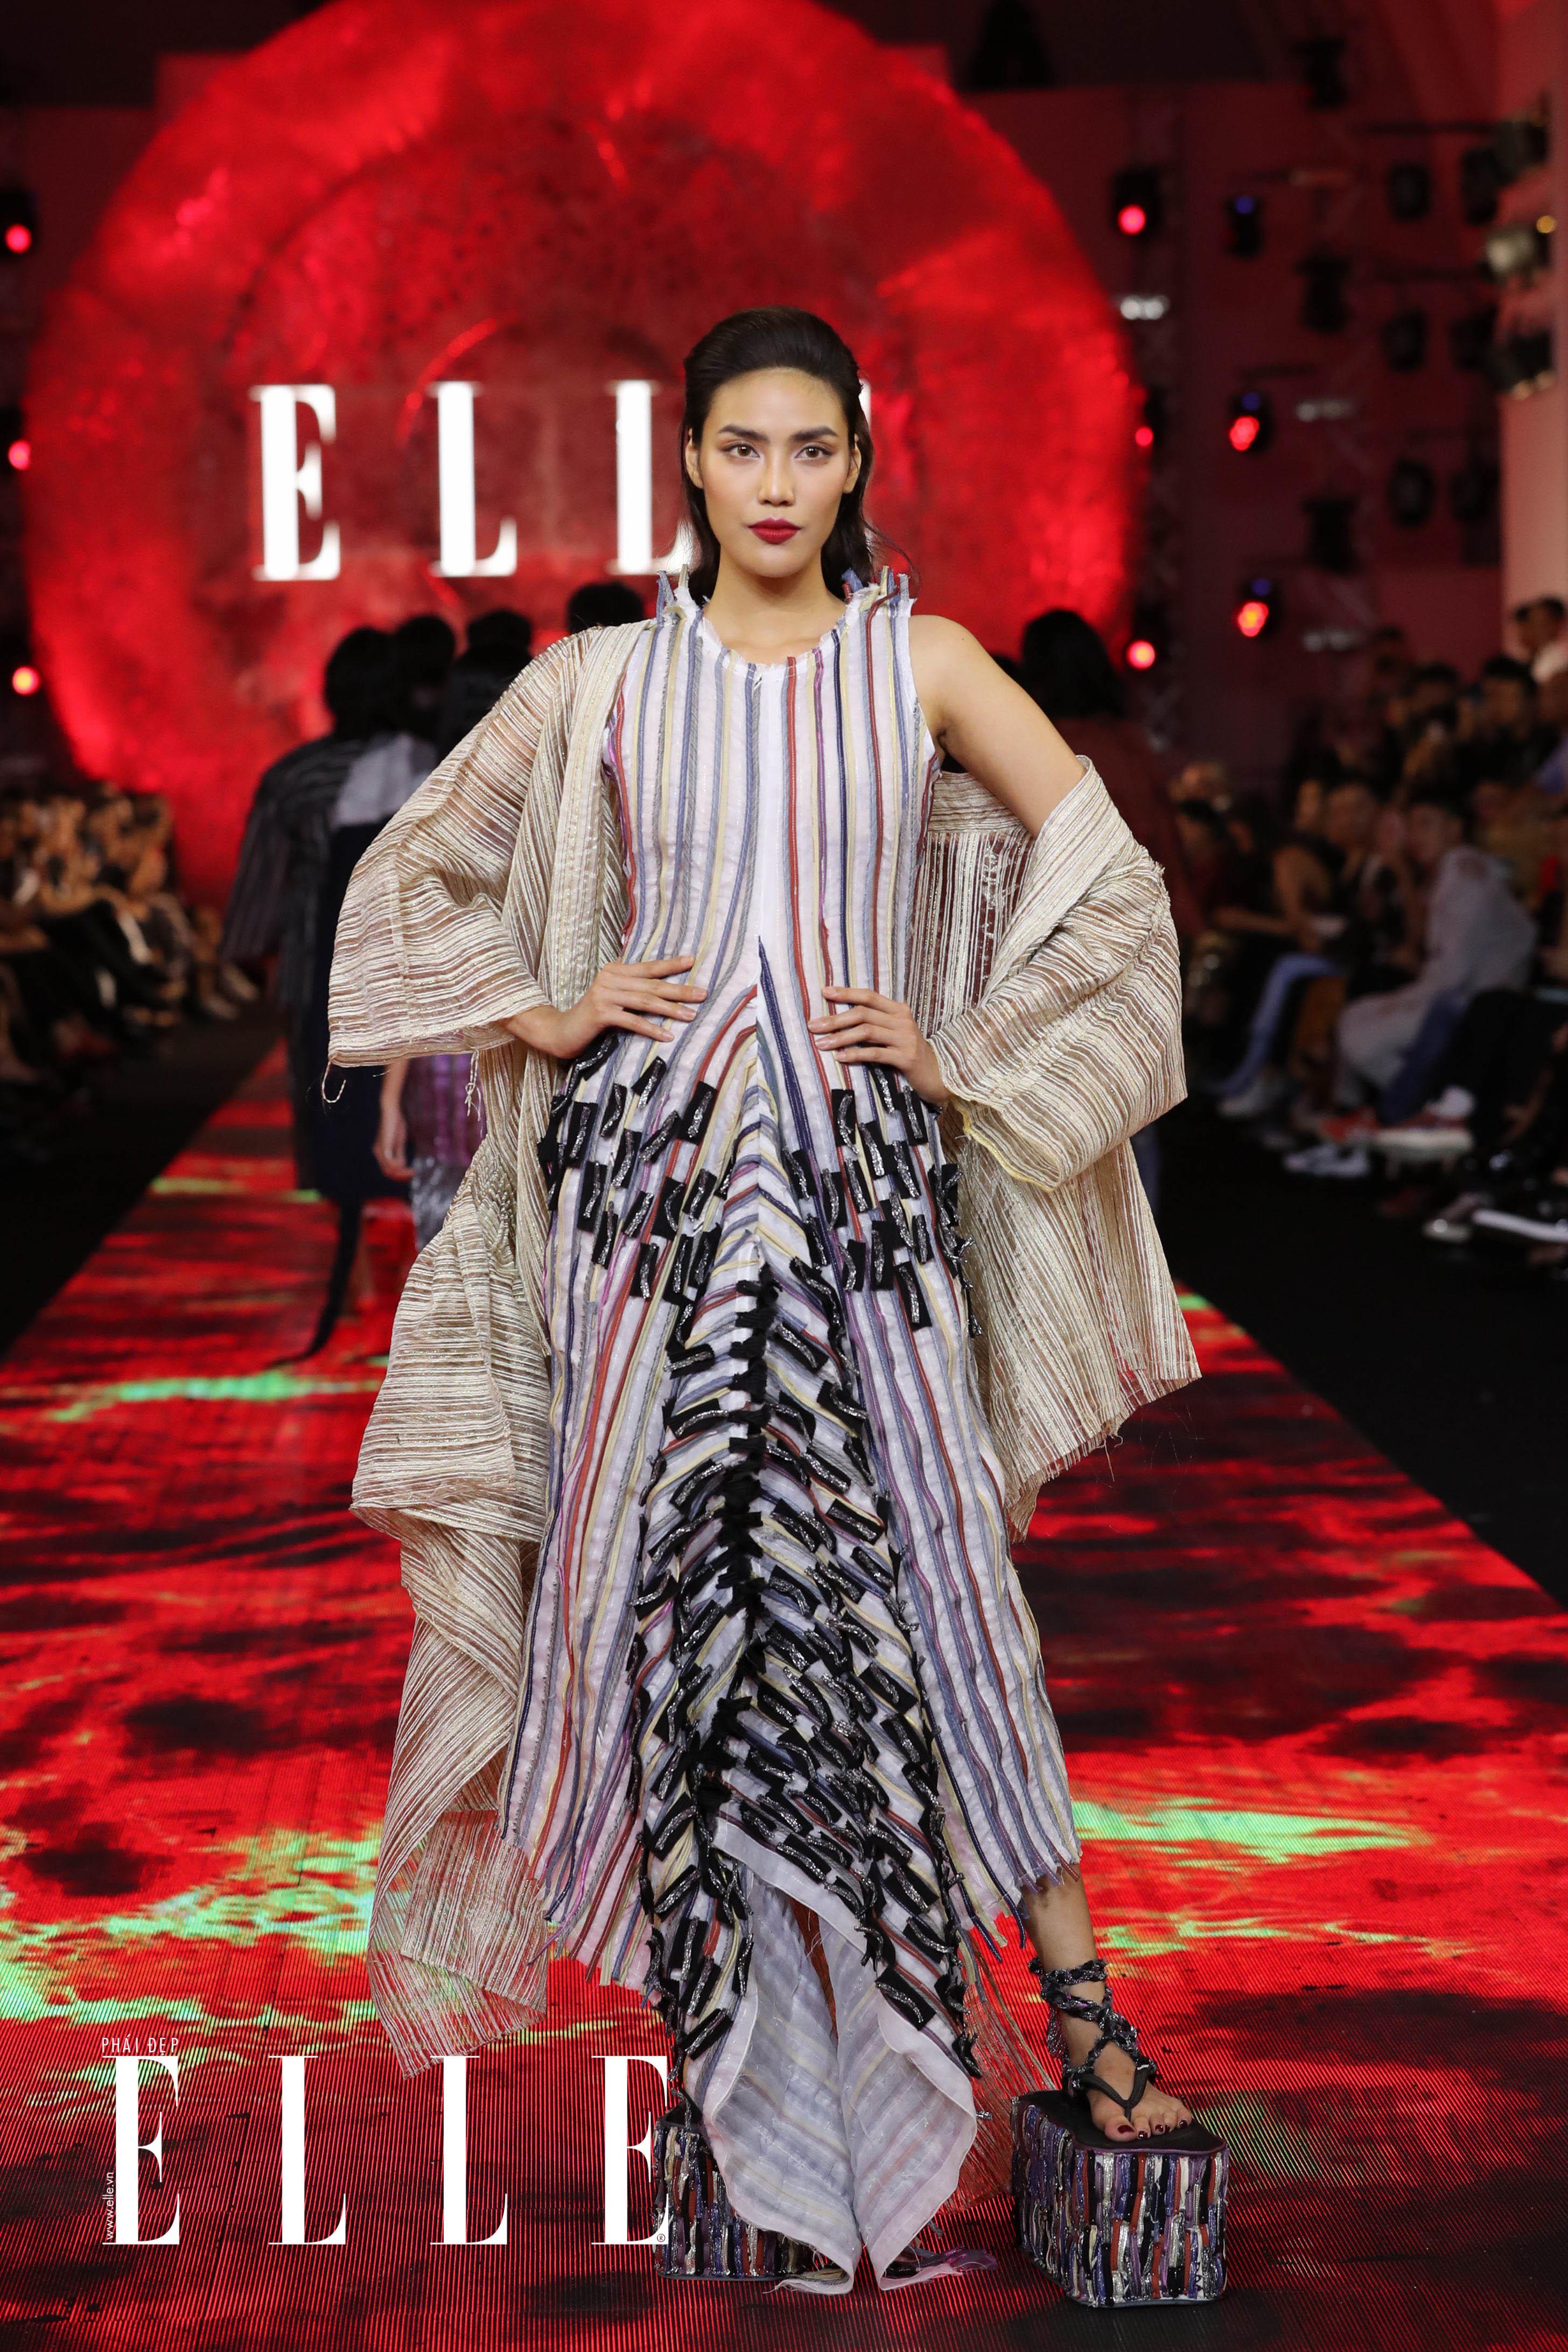 xu huong trang tu nhien diem thong linh san dien elle fashion journey 2018 08